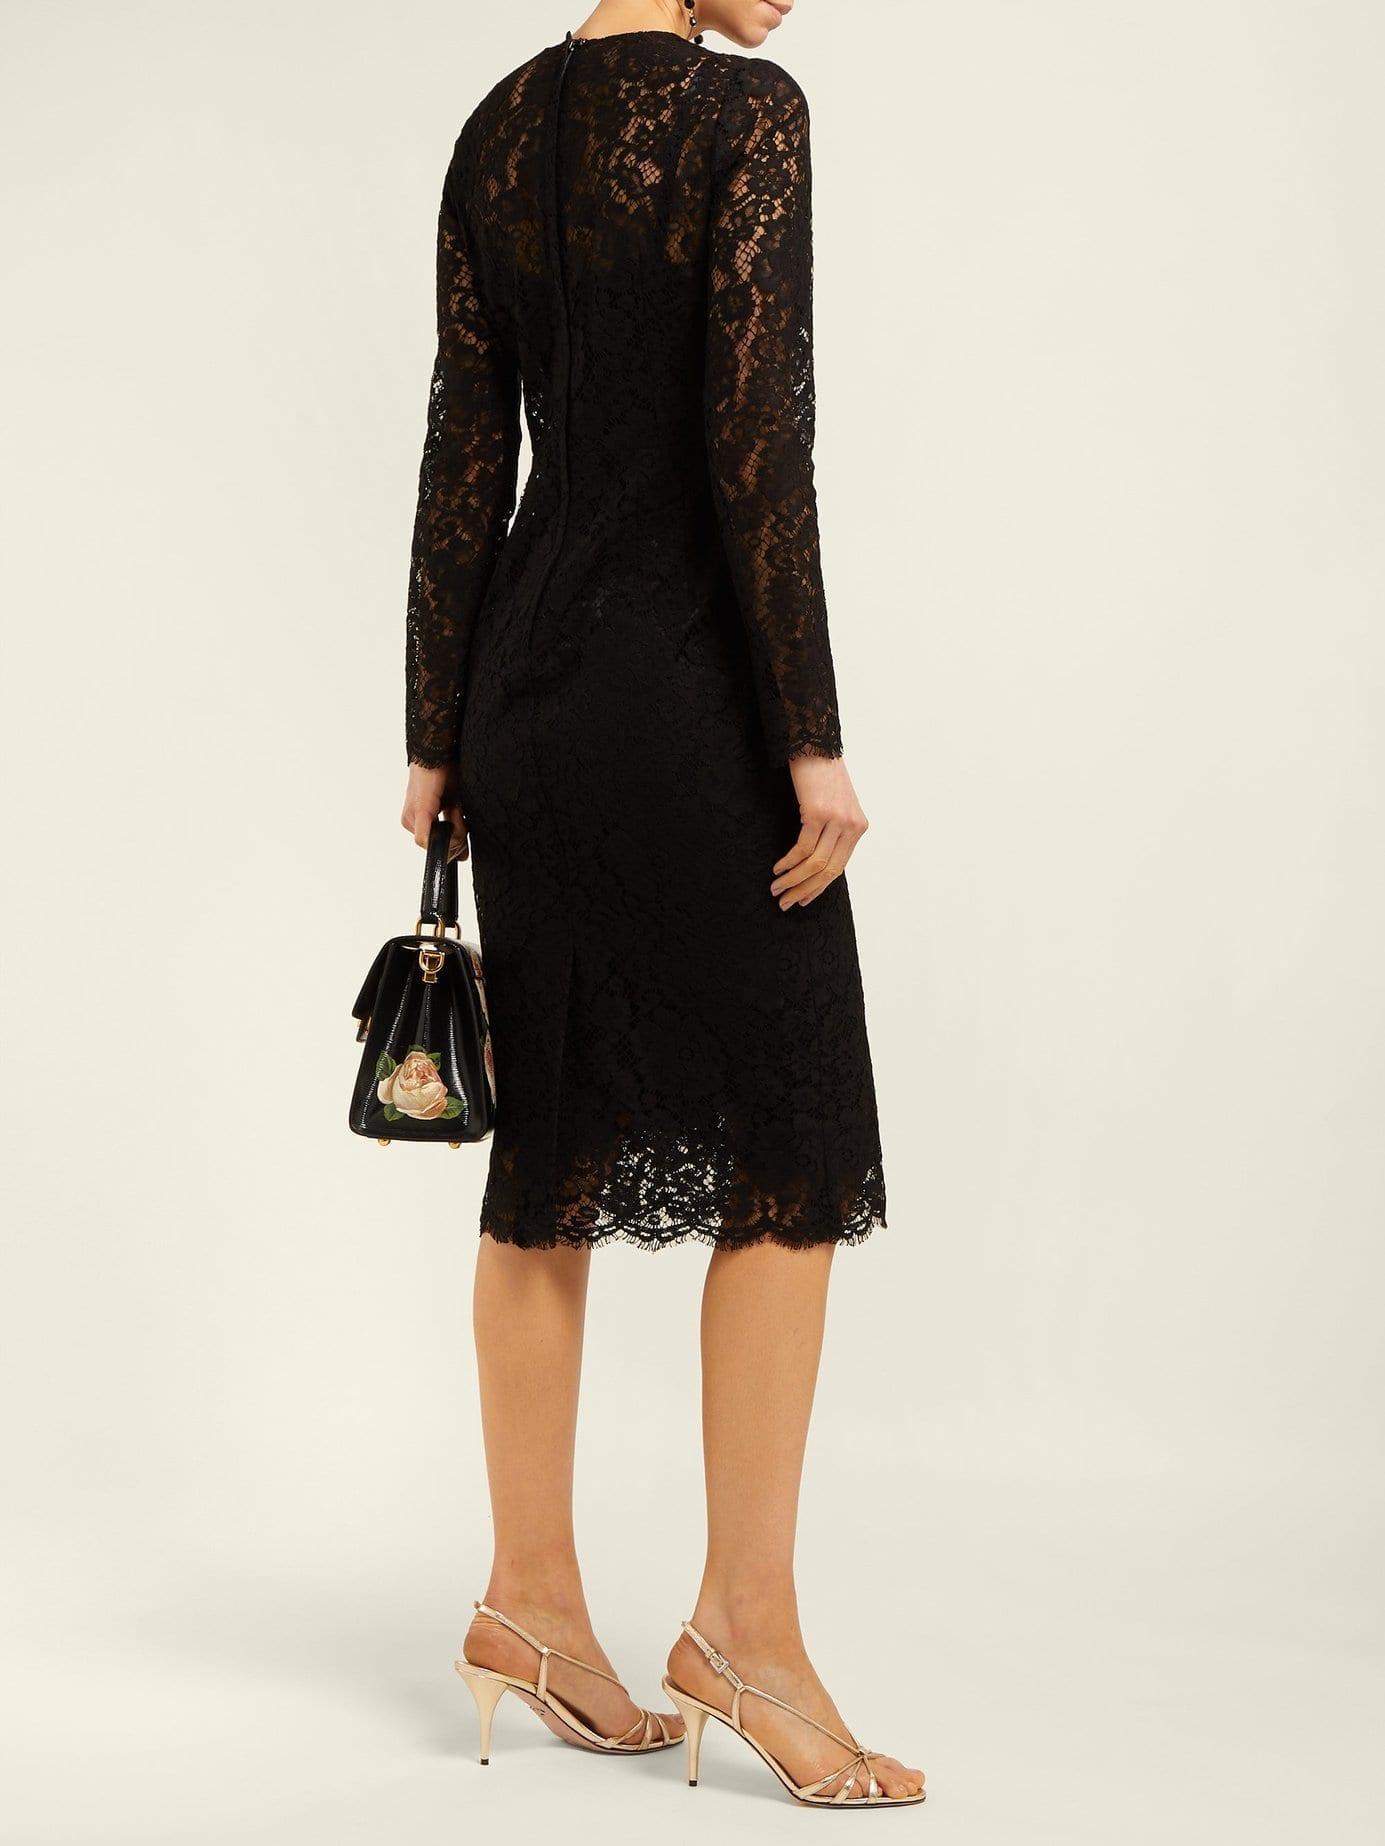 7ea65a4c568d DOLCE & GABBANA Floral And Eyelash-lace Midi Black Dress - We Select ...